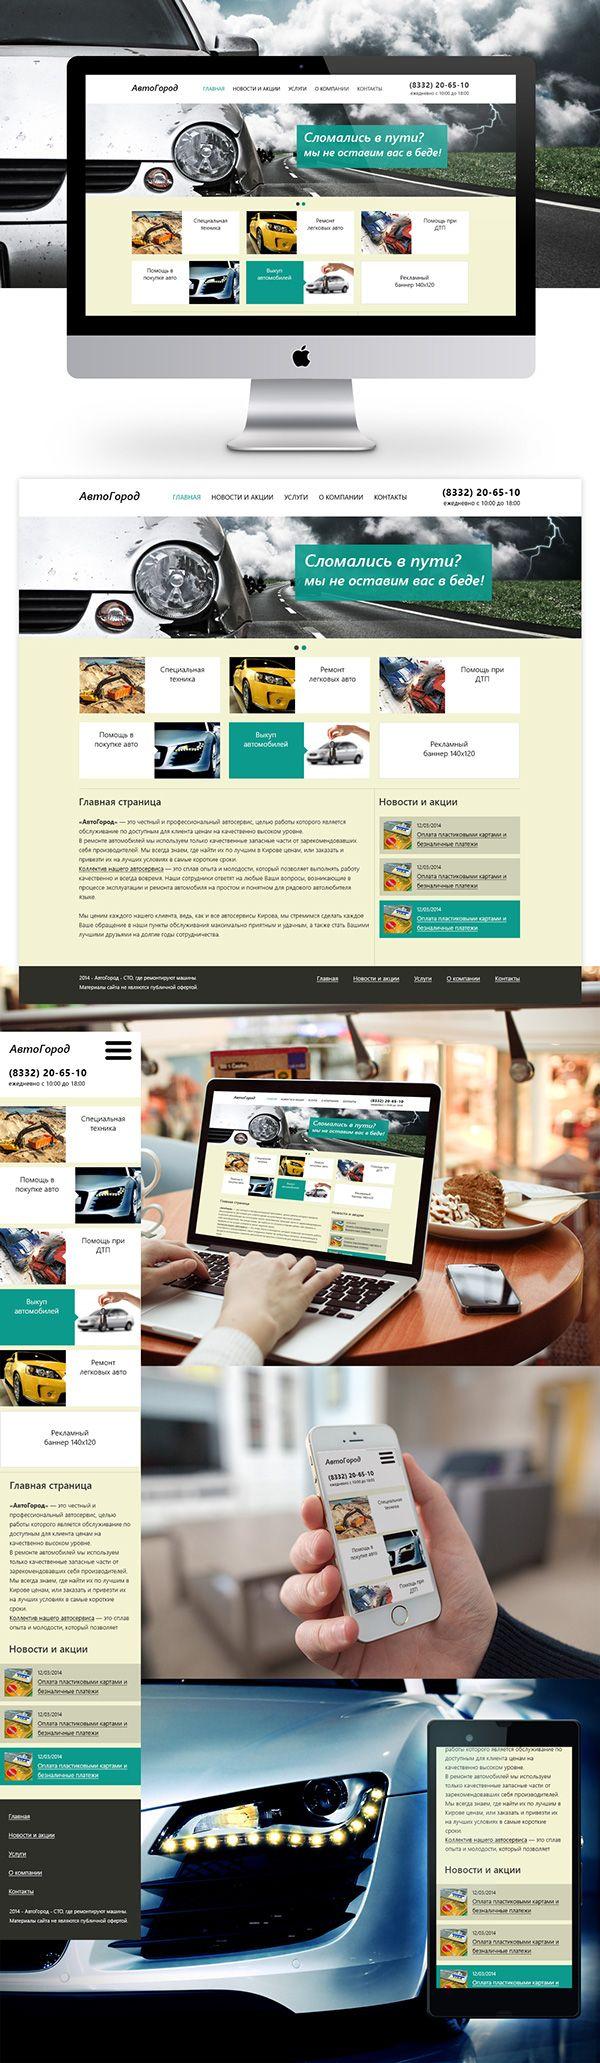 """CarCity"" landing page by Alexander Petrov, via Behance"